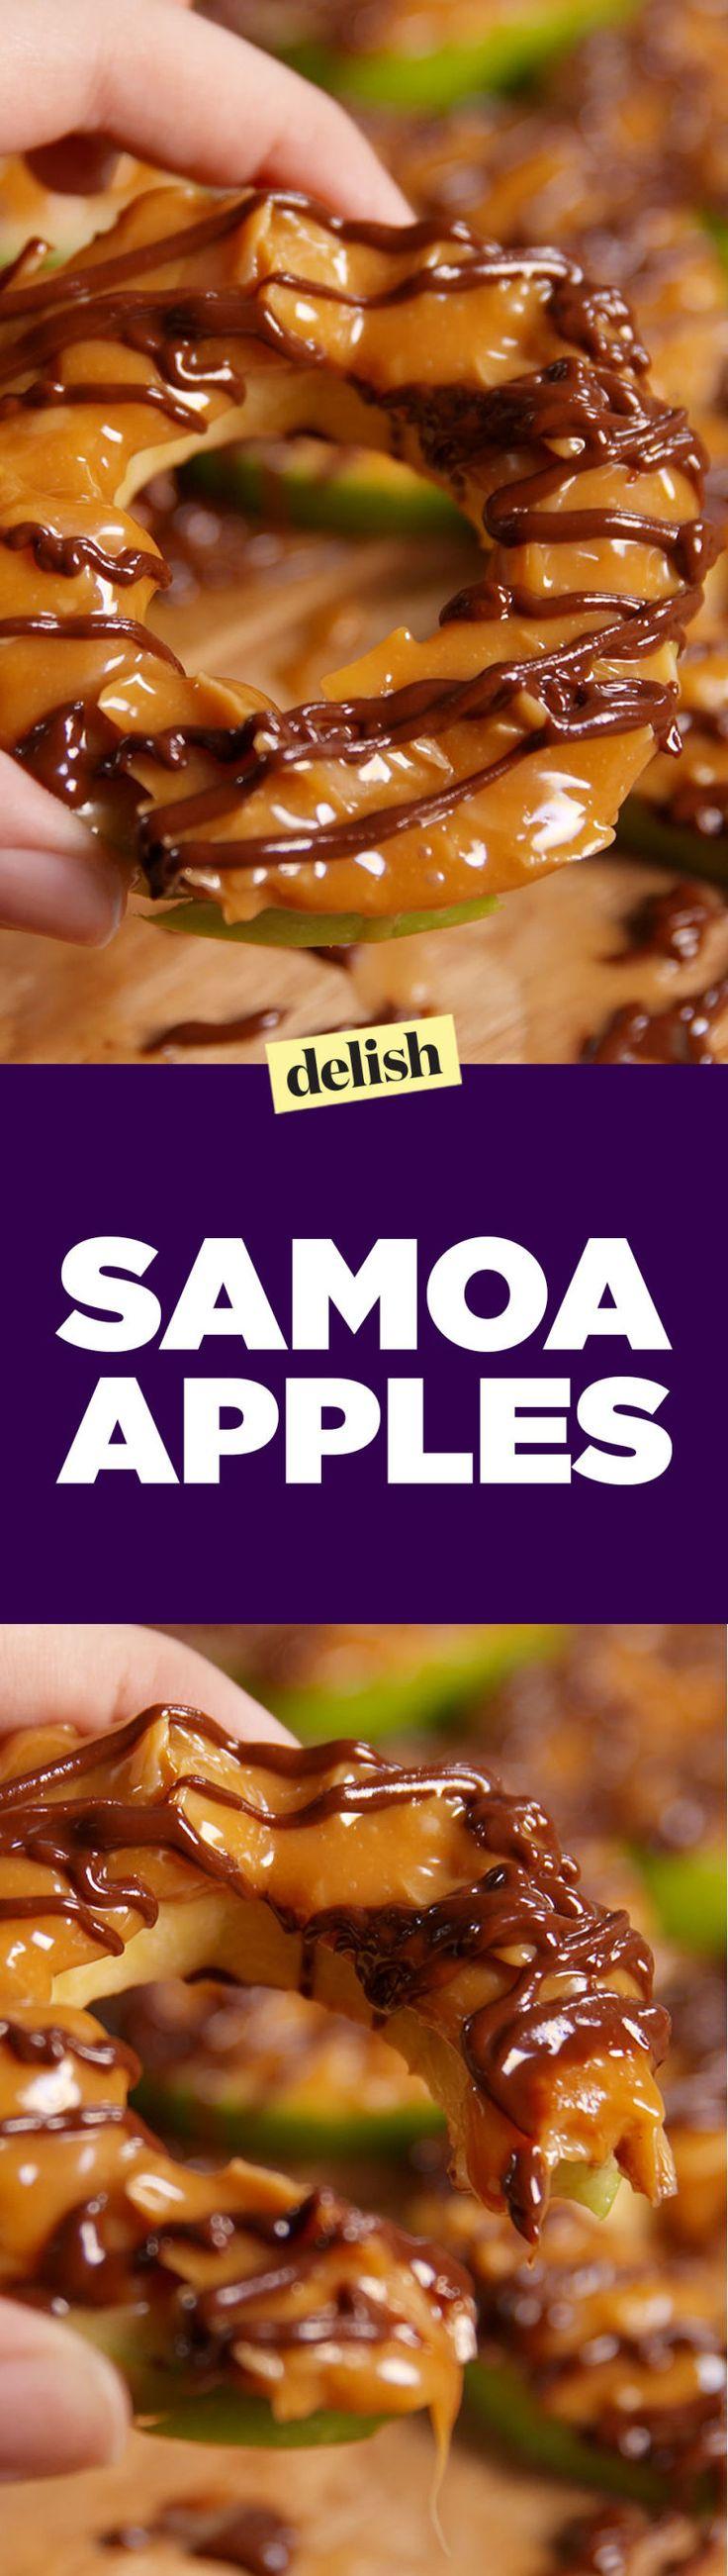 Samoa Apple Slices  - Delish.com